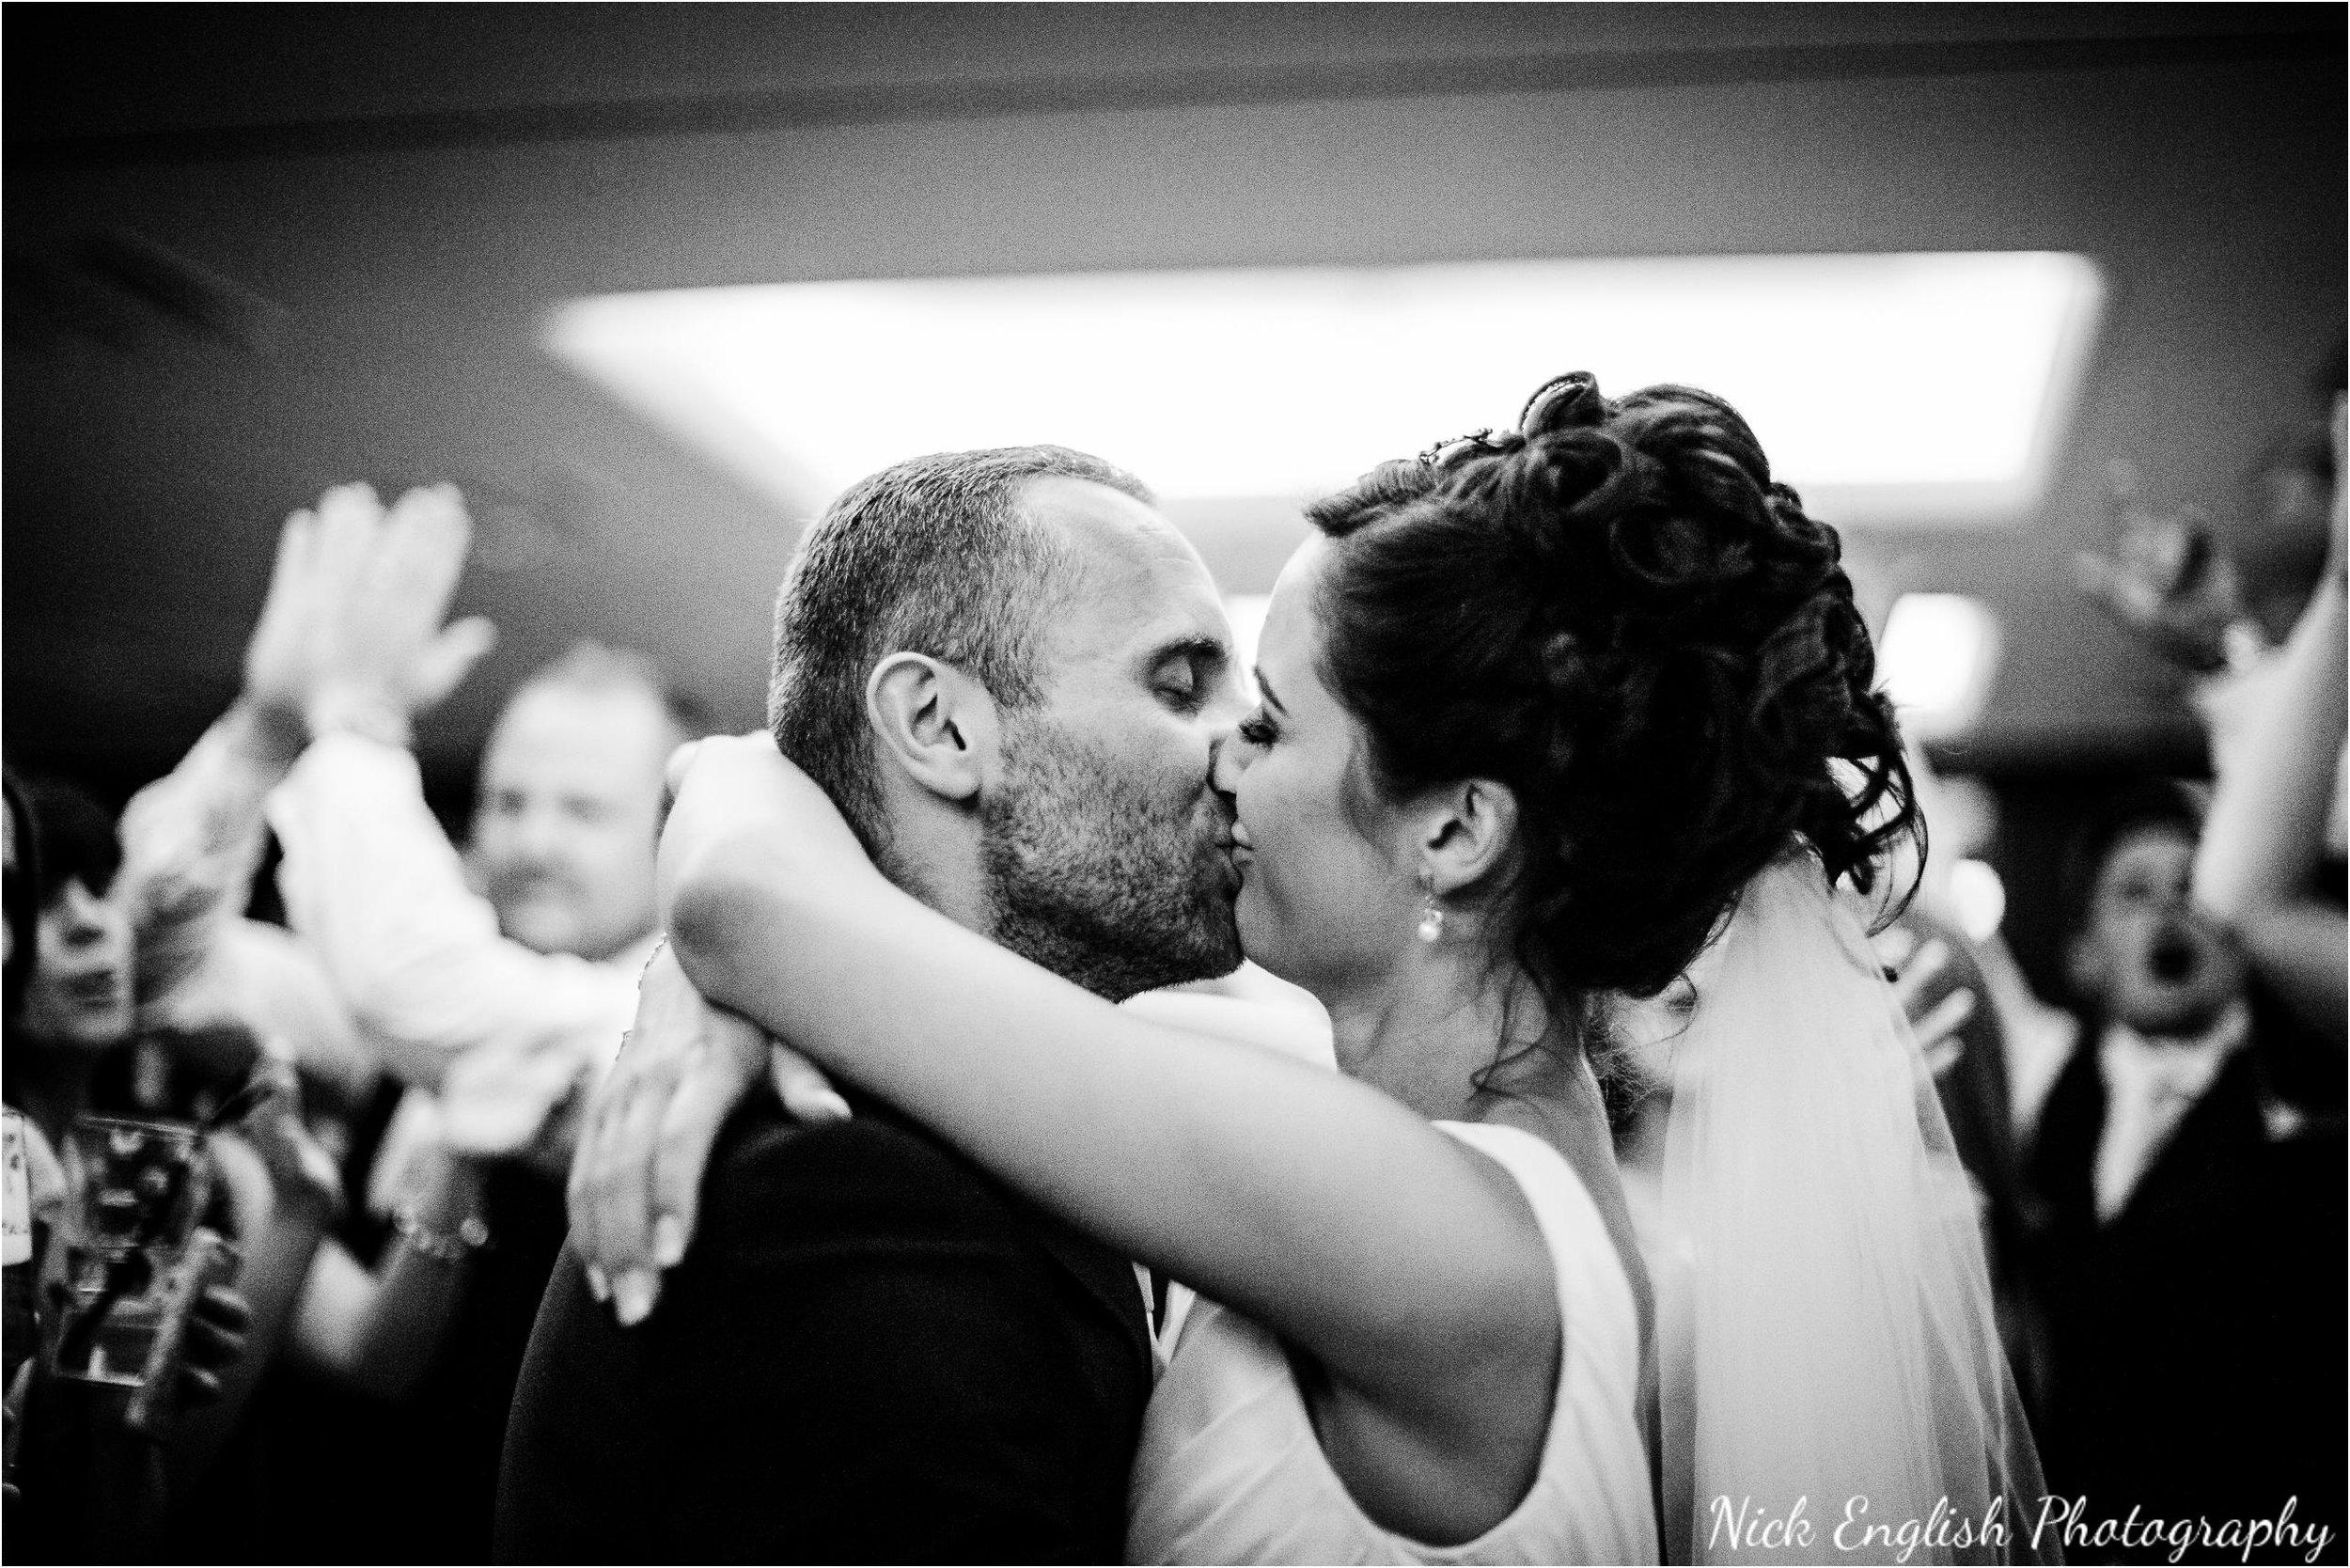 Emily David Wedding Photographs at Barton Grange Preston by Nick English Photography 230jpg.jpeg